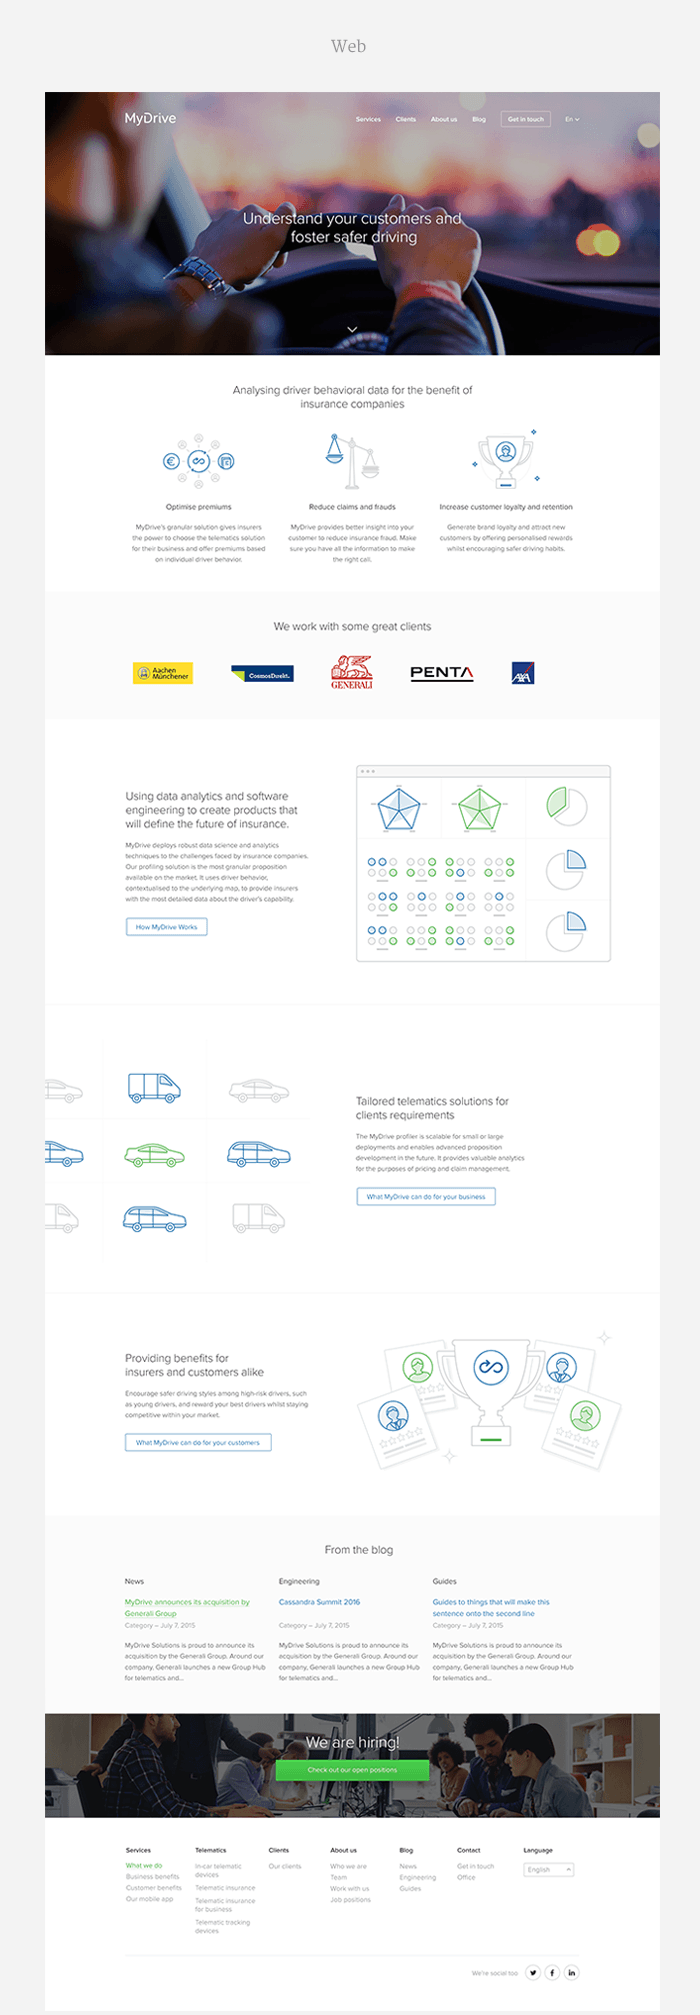 MyDrive Web